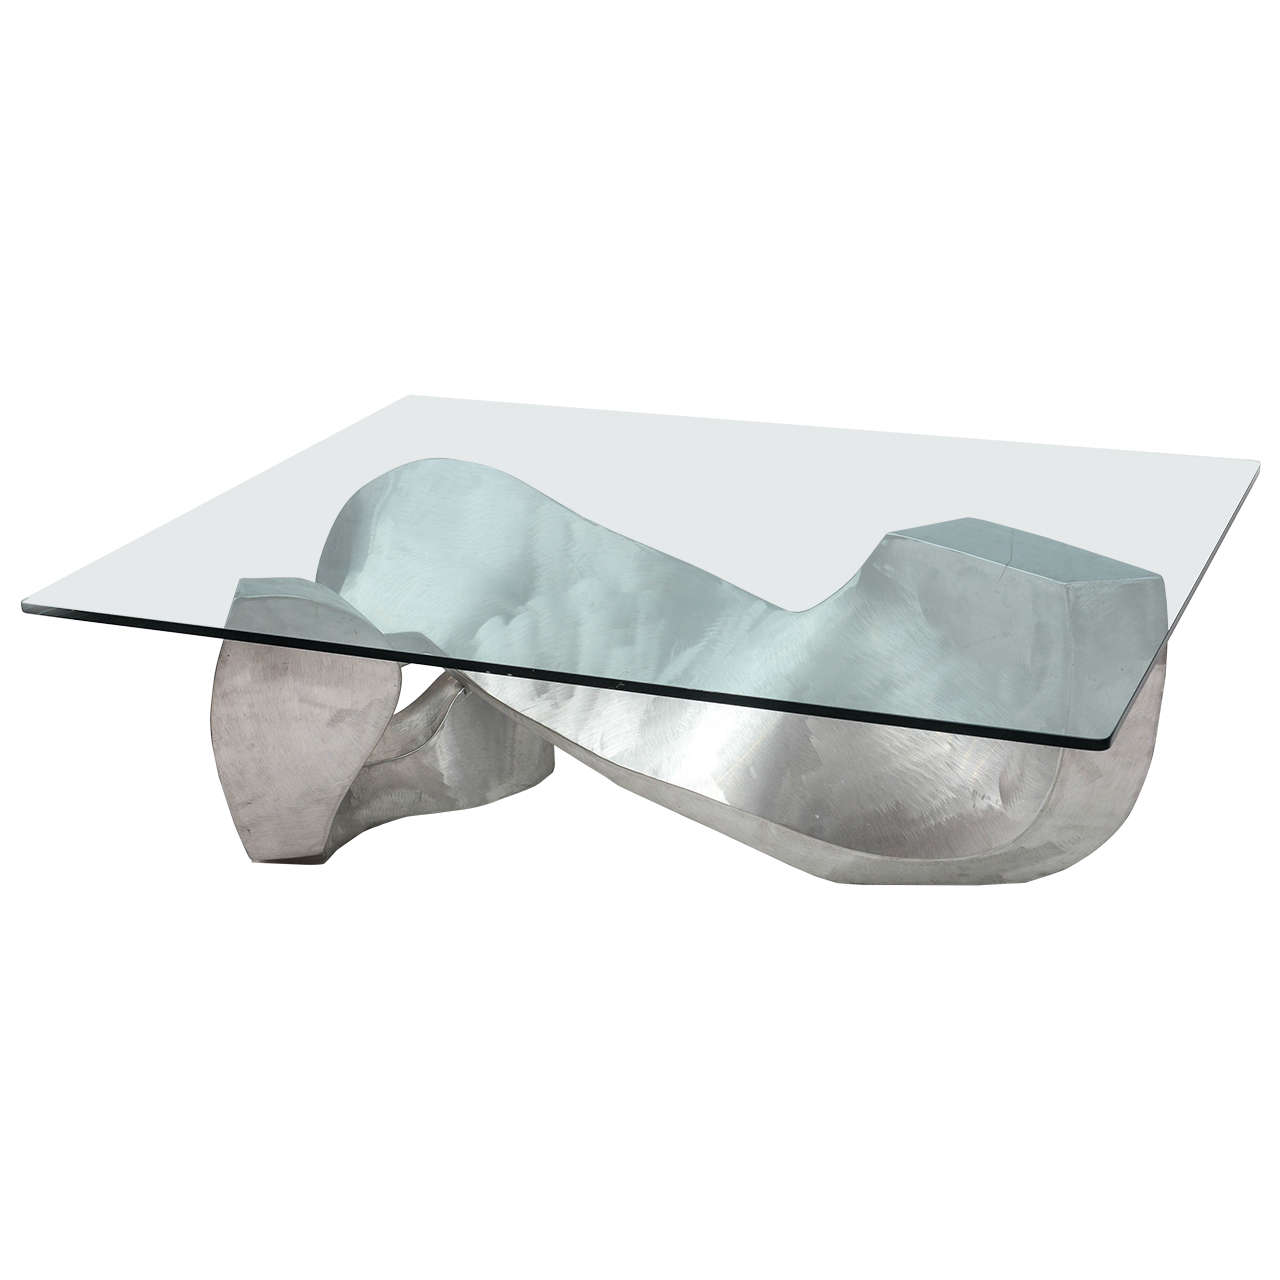 Bill Barrett Fabricated Aluminum Sculpture Coffee Table Bill